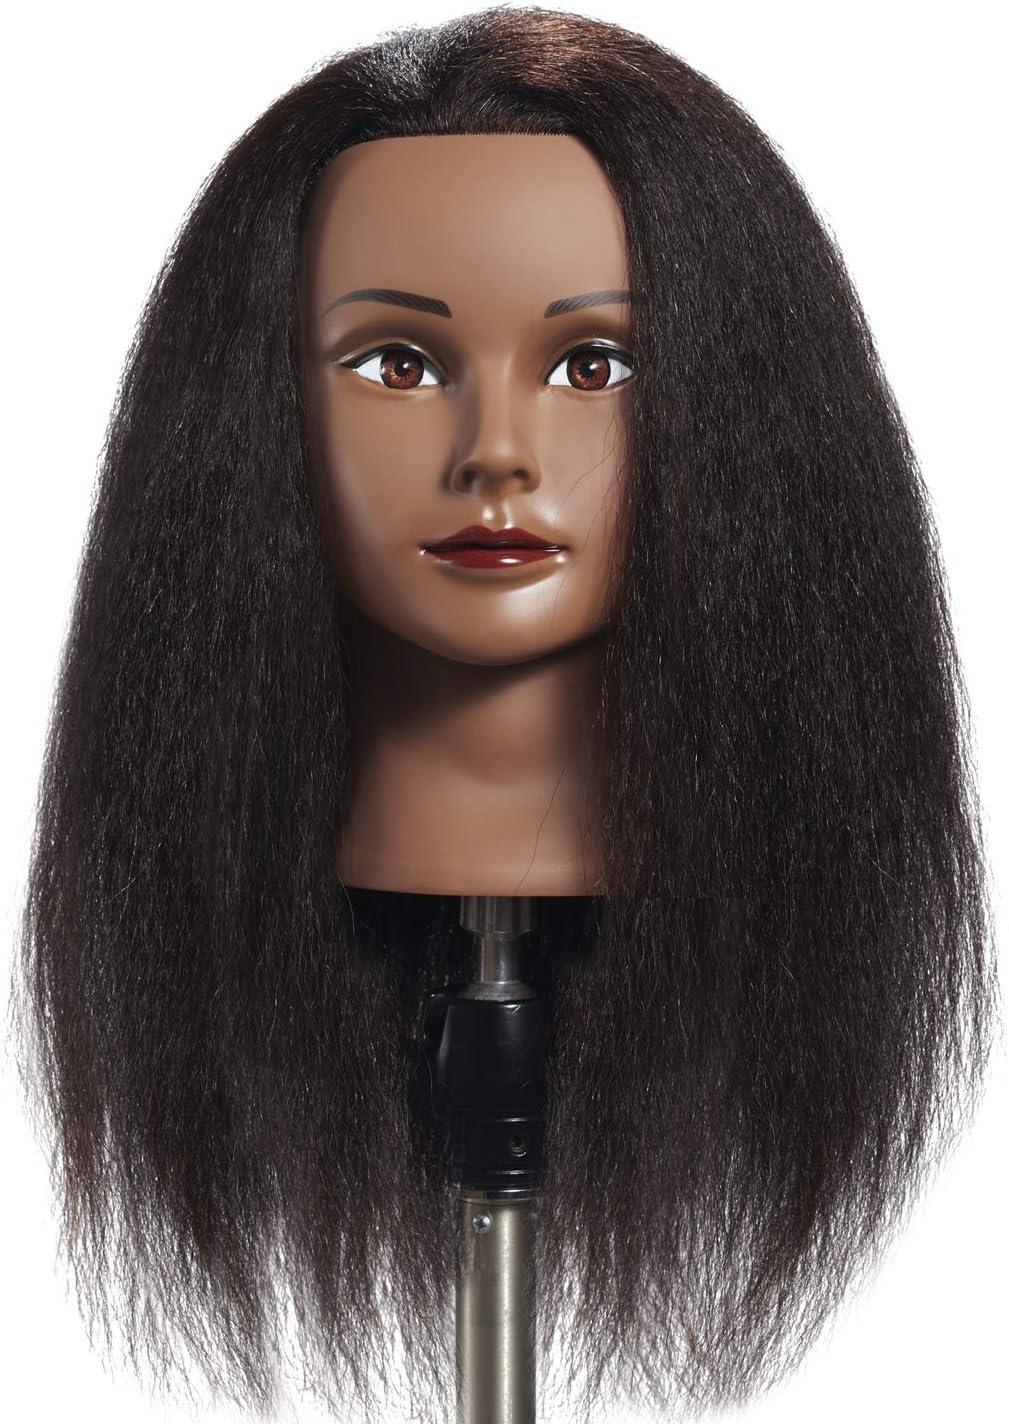 Hairginkgo 100 Real Hair Mannequin Head Hairdresser Training Head Manikin Cosmetology Doll Head 91711b0216 Amazon Ca Beauty